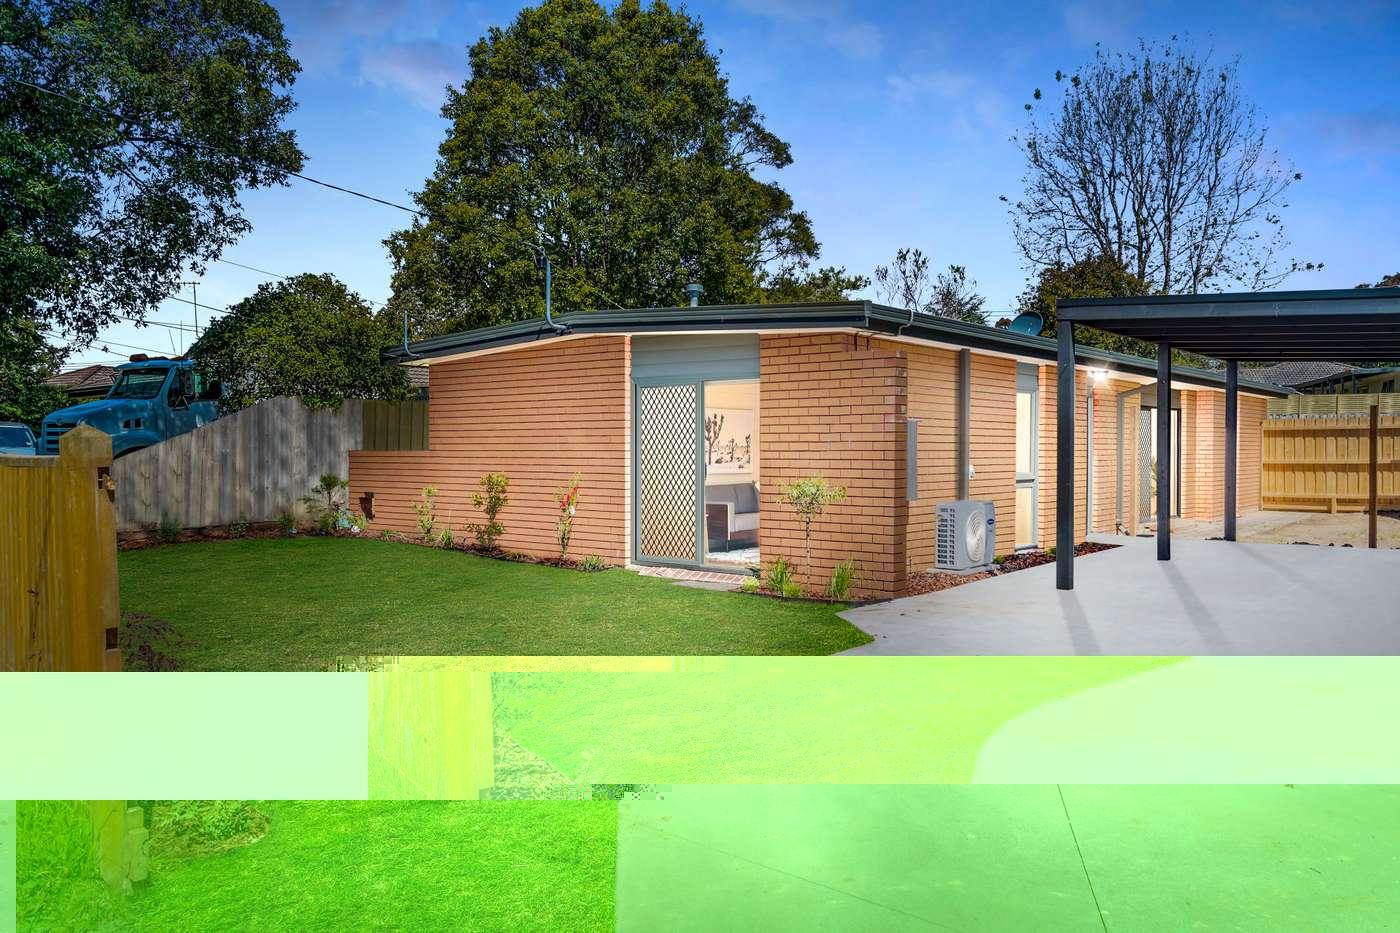 Main view of Homely house listing, 10b Glazebury Court, Langwarrin, VIC 3910